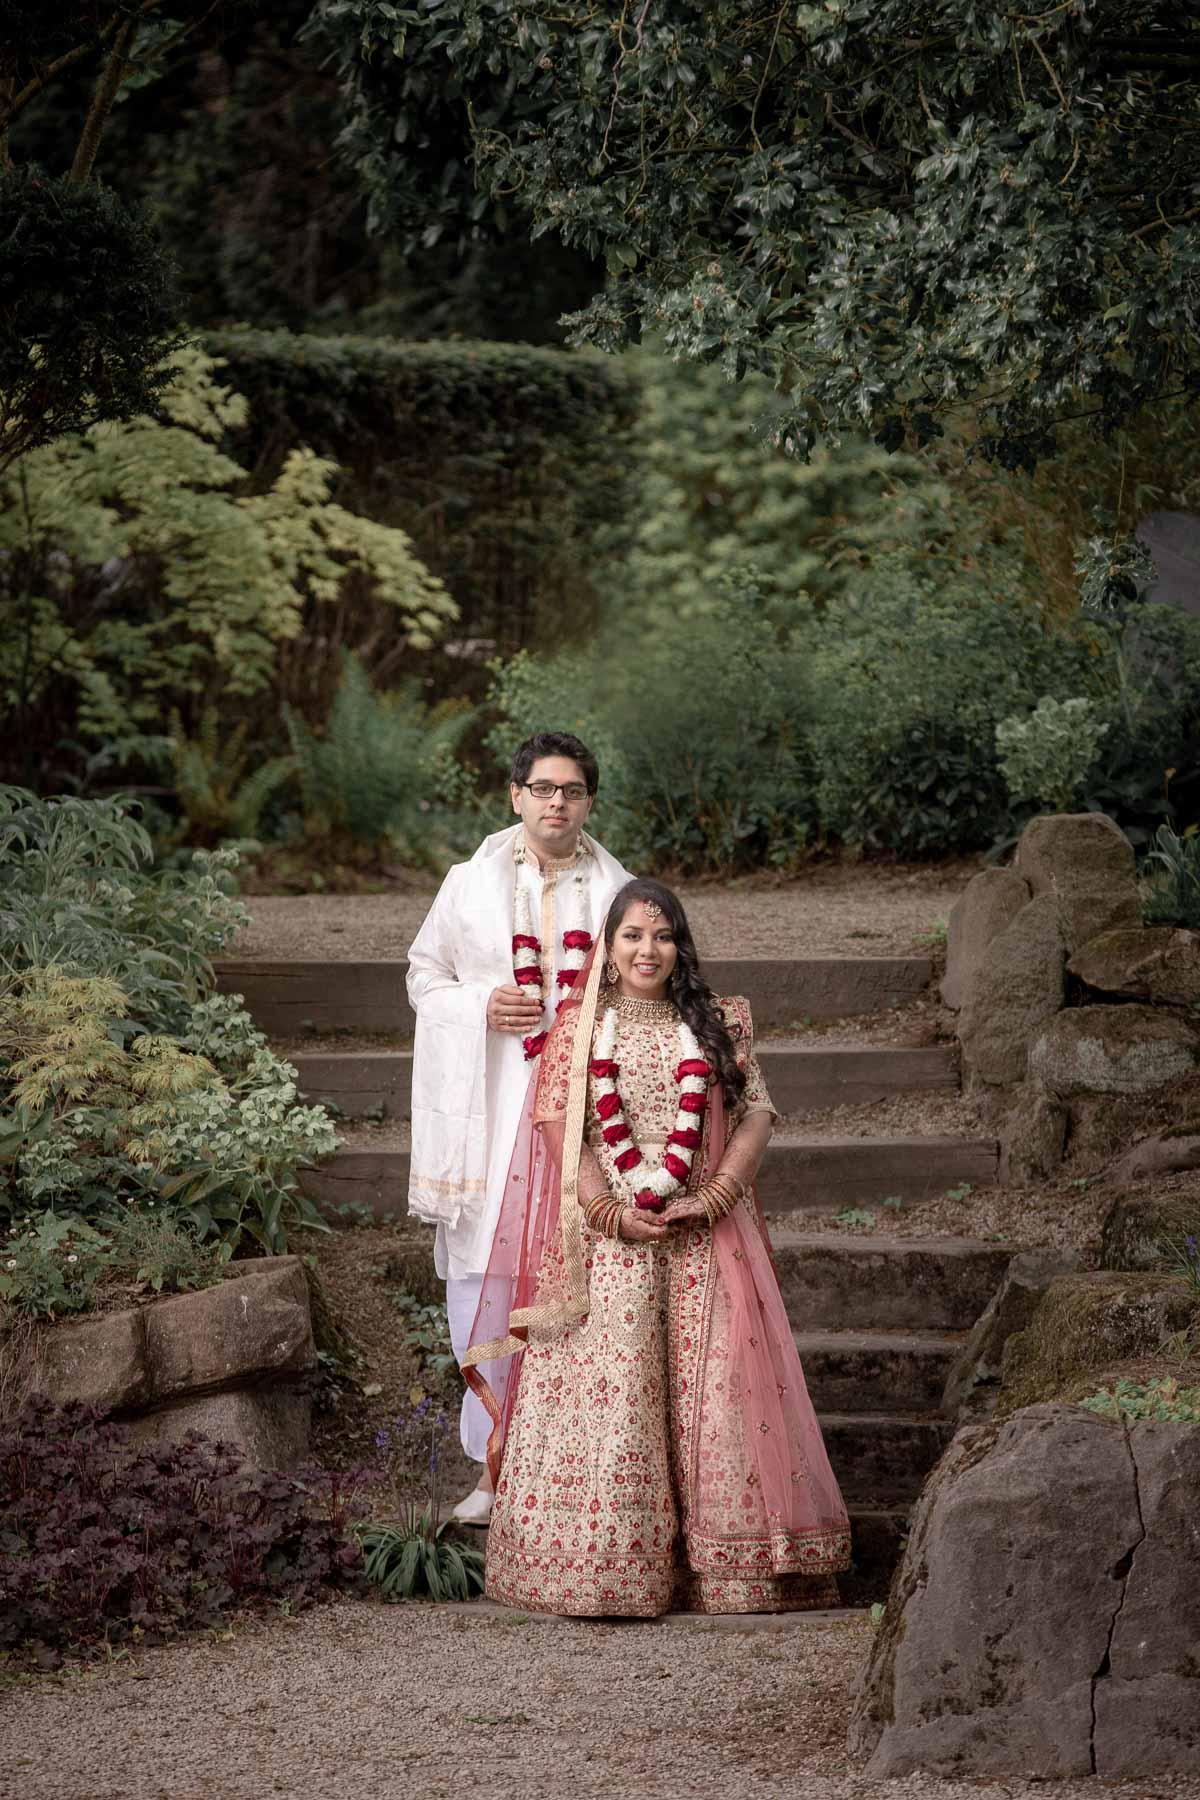 botanical-gardens-asian-wedding-photographer-0005.jpg